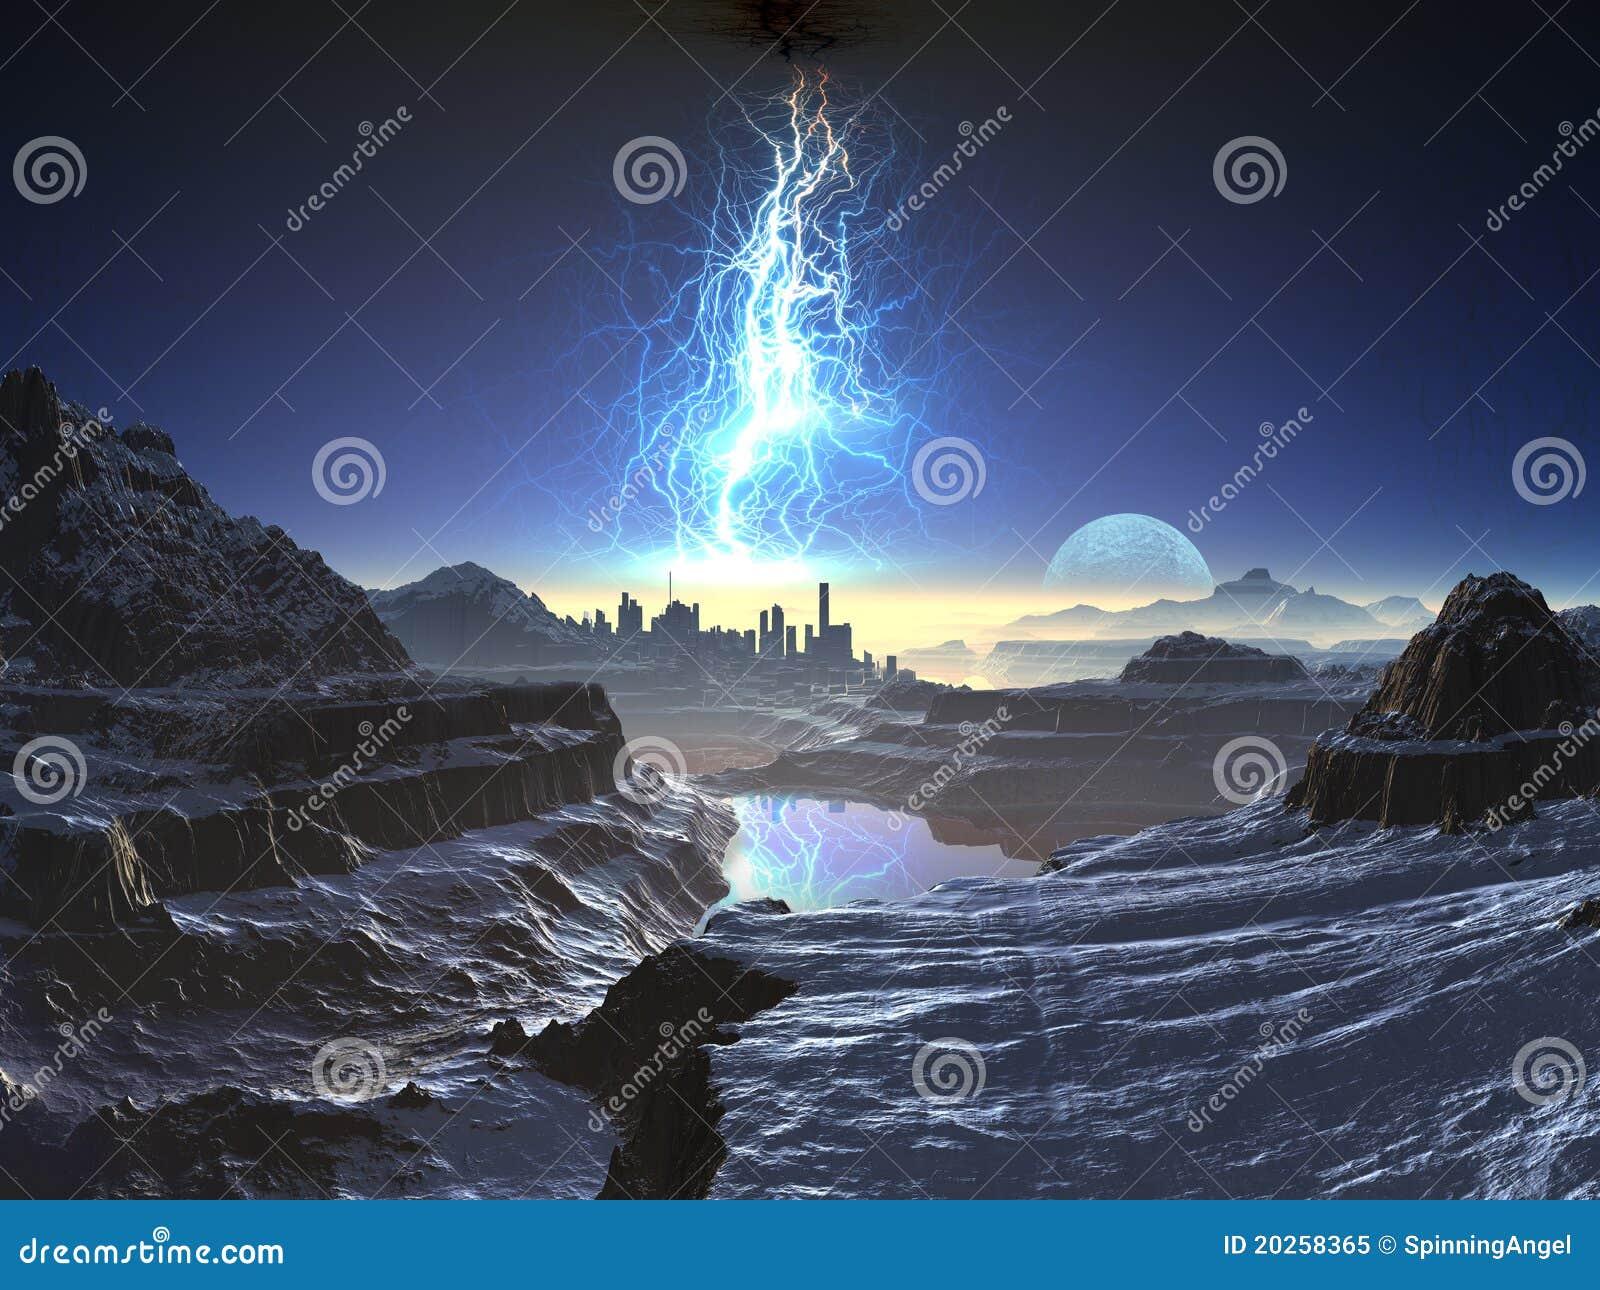 Electric Storm over Distant Alien City